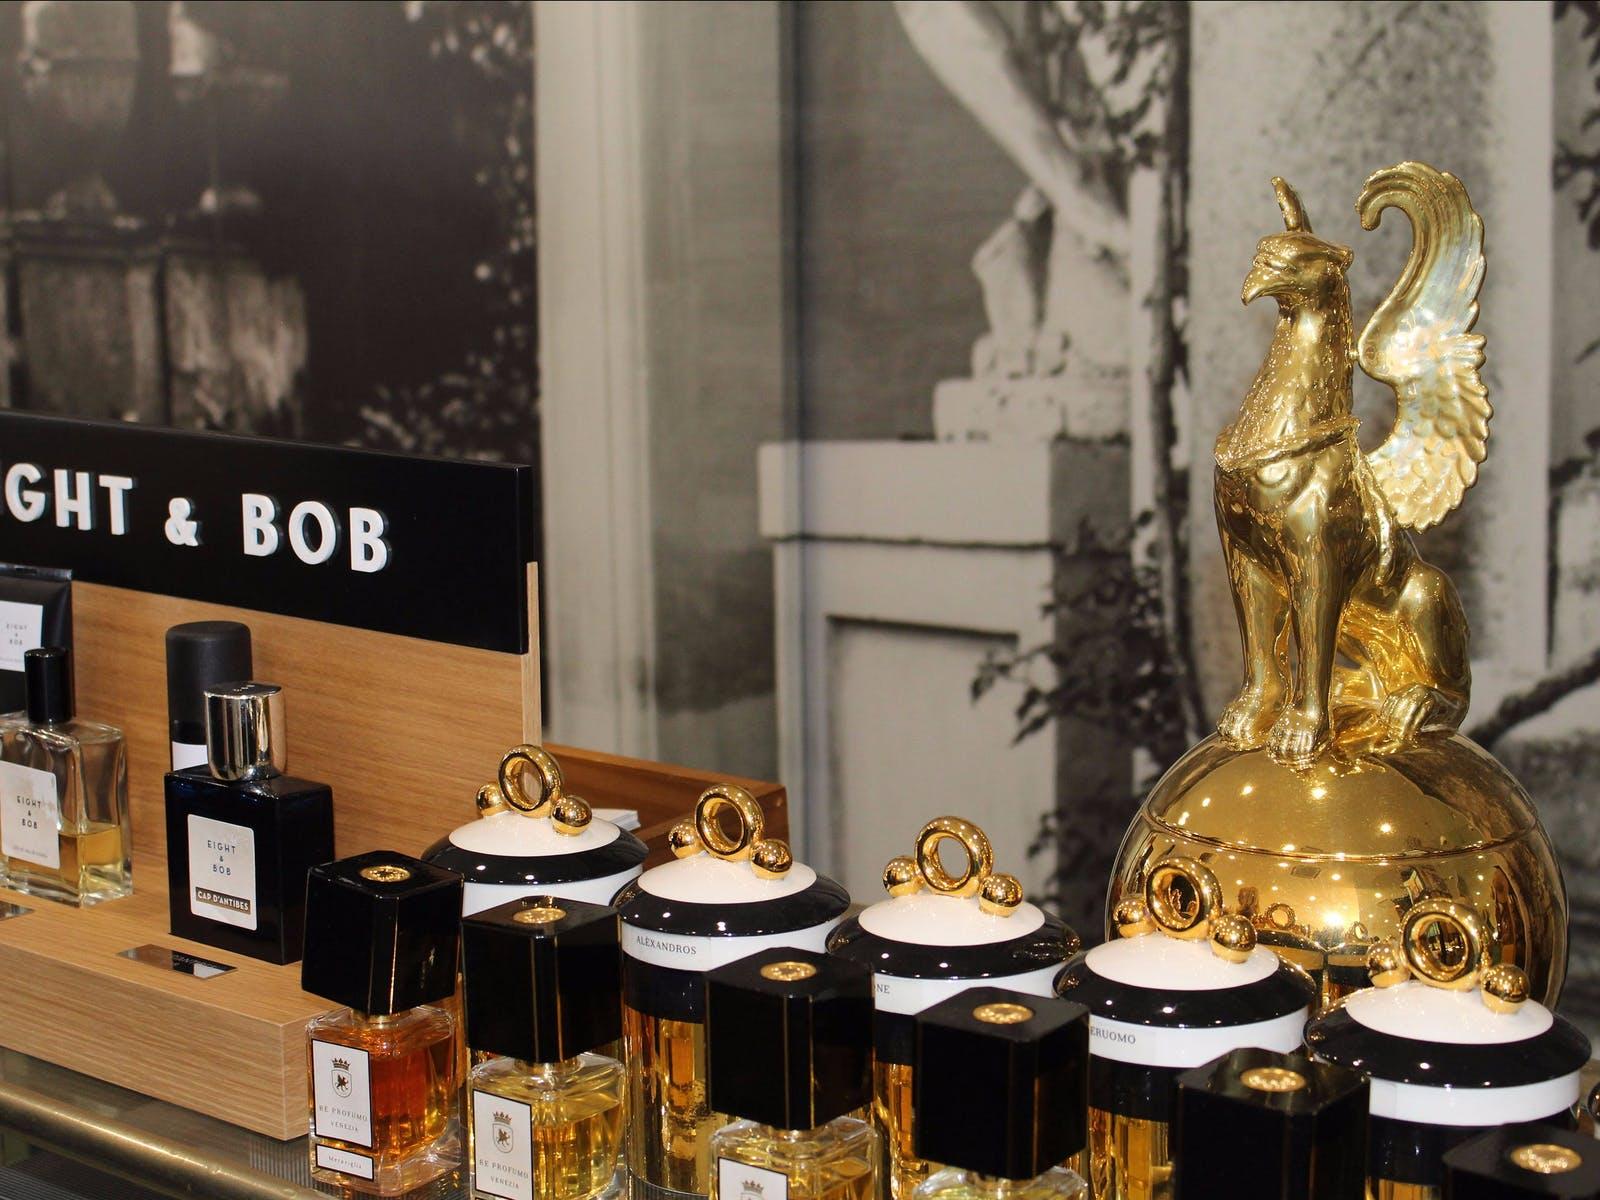 Niche perfumes from around the world